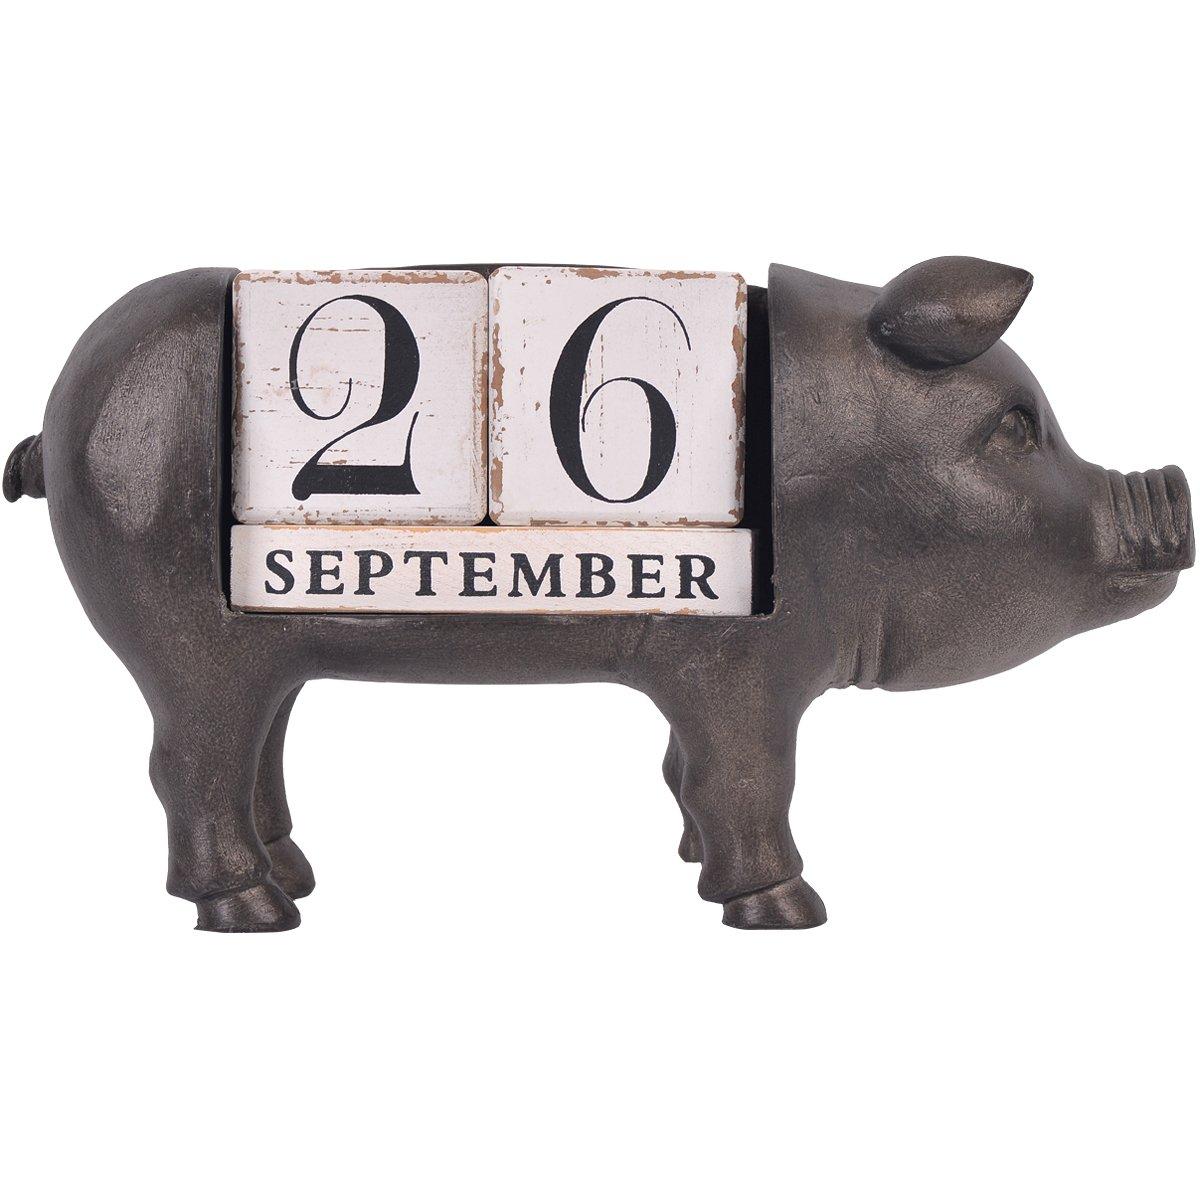 NIKKY HOME Vintage Animal Pig Perpetual Desk Calendar Blocks, Black by NIKKY HOME